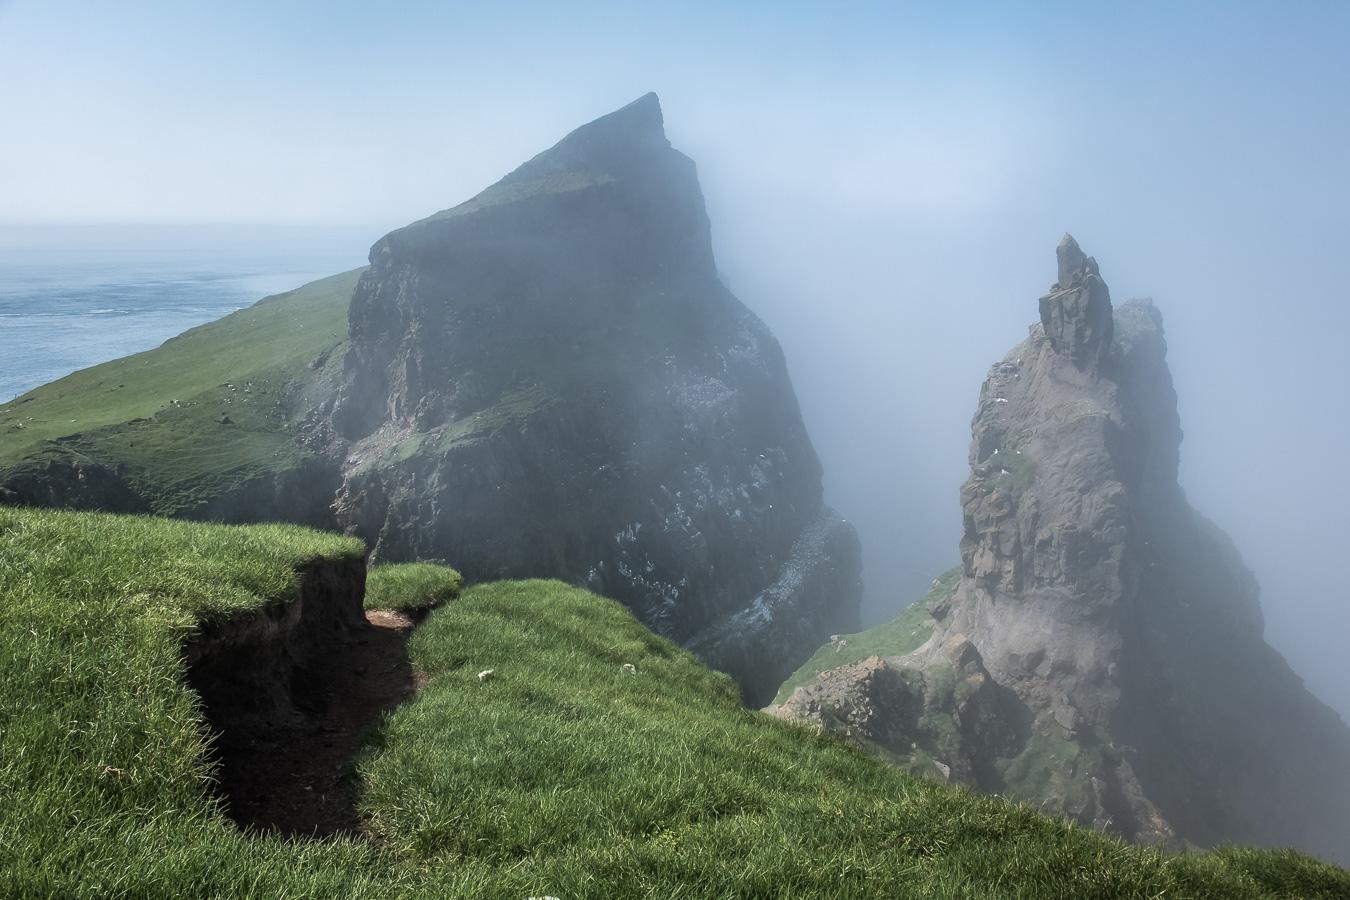 Mykines cliffs